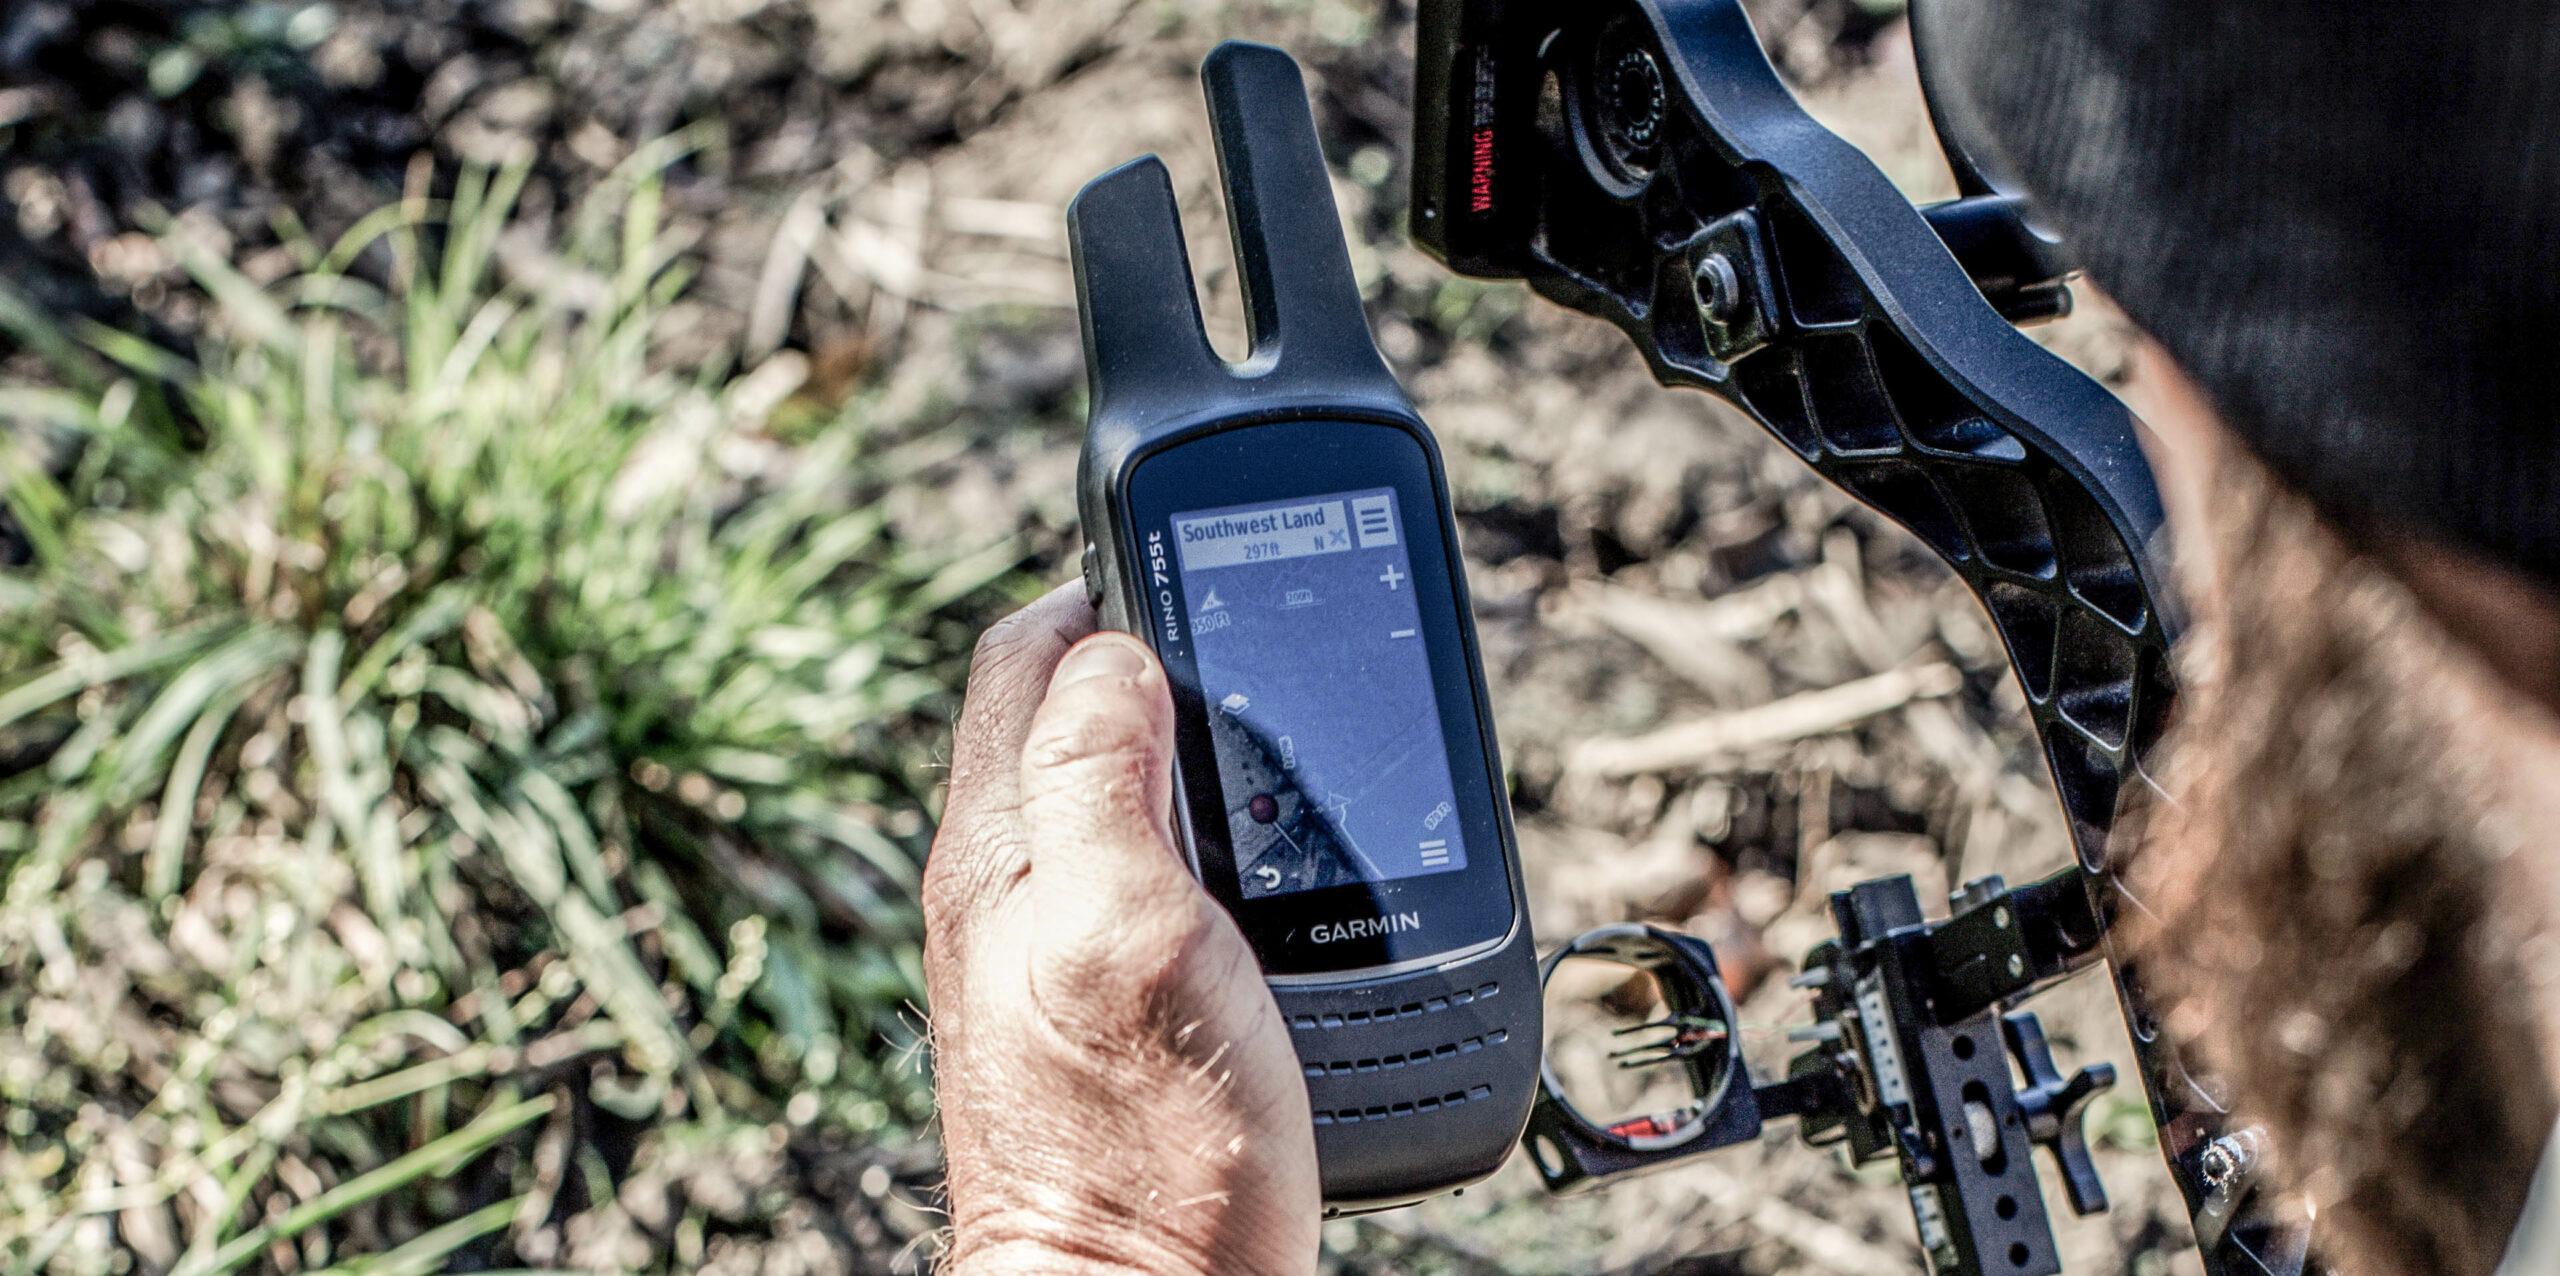 Garmin Hunting Electronics